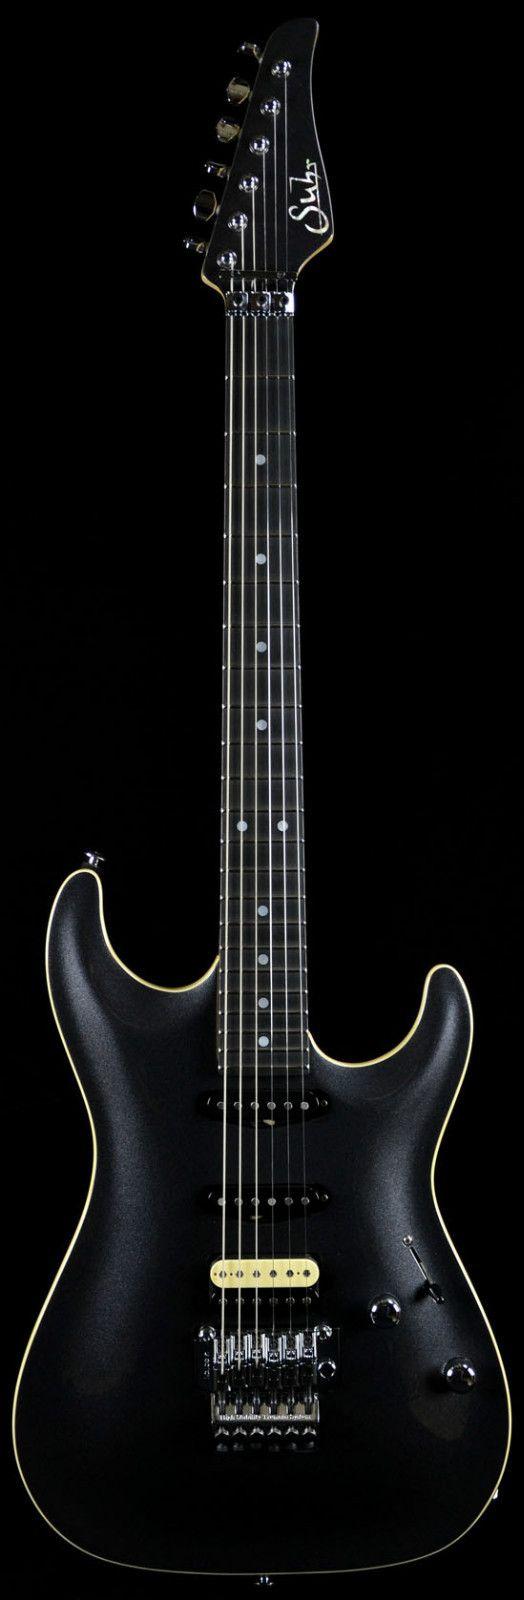 Suhr Carve Top Standard in Black Pearl Metallic w/ Ivoroid Binding - Brand NEW! | eBay